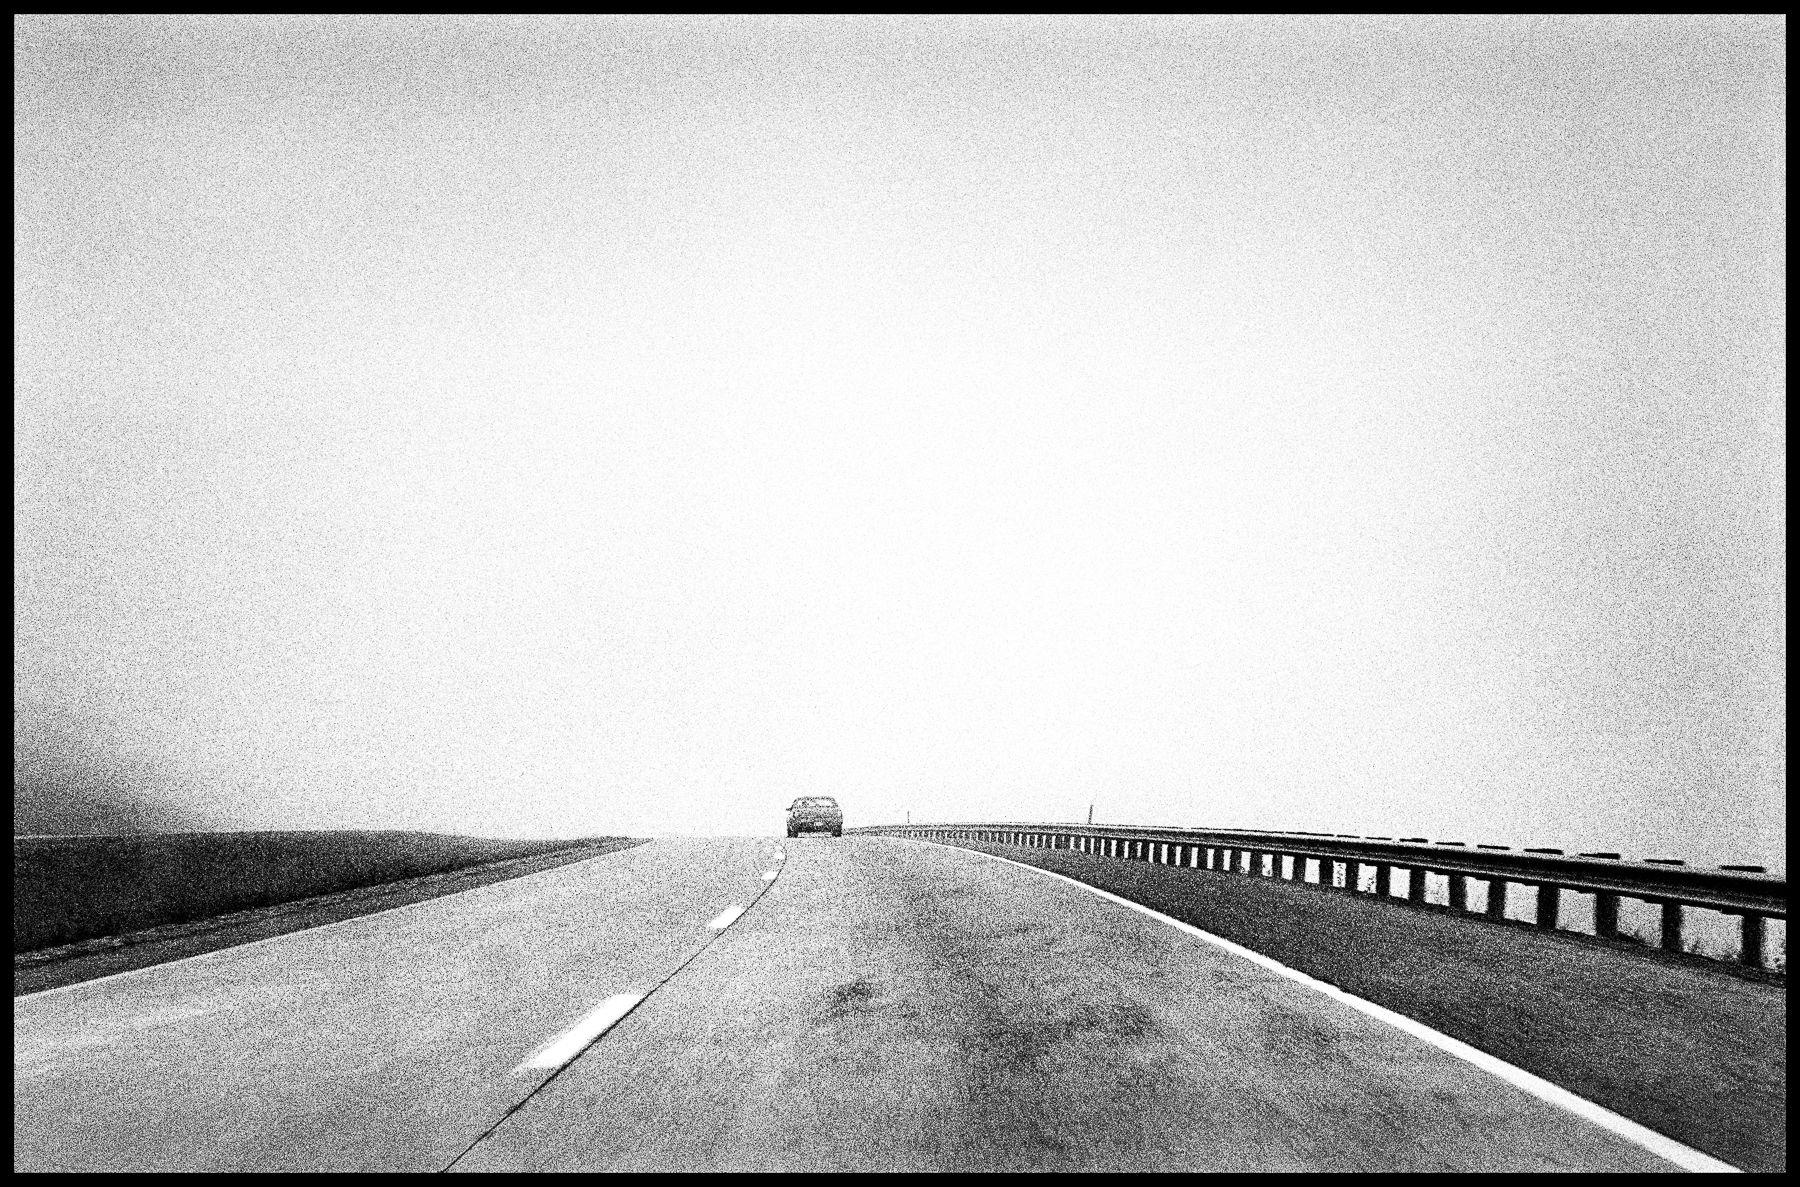 Interstate Hwy. 64, WV, 1986